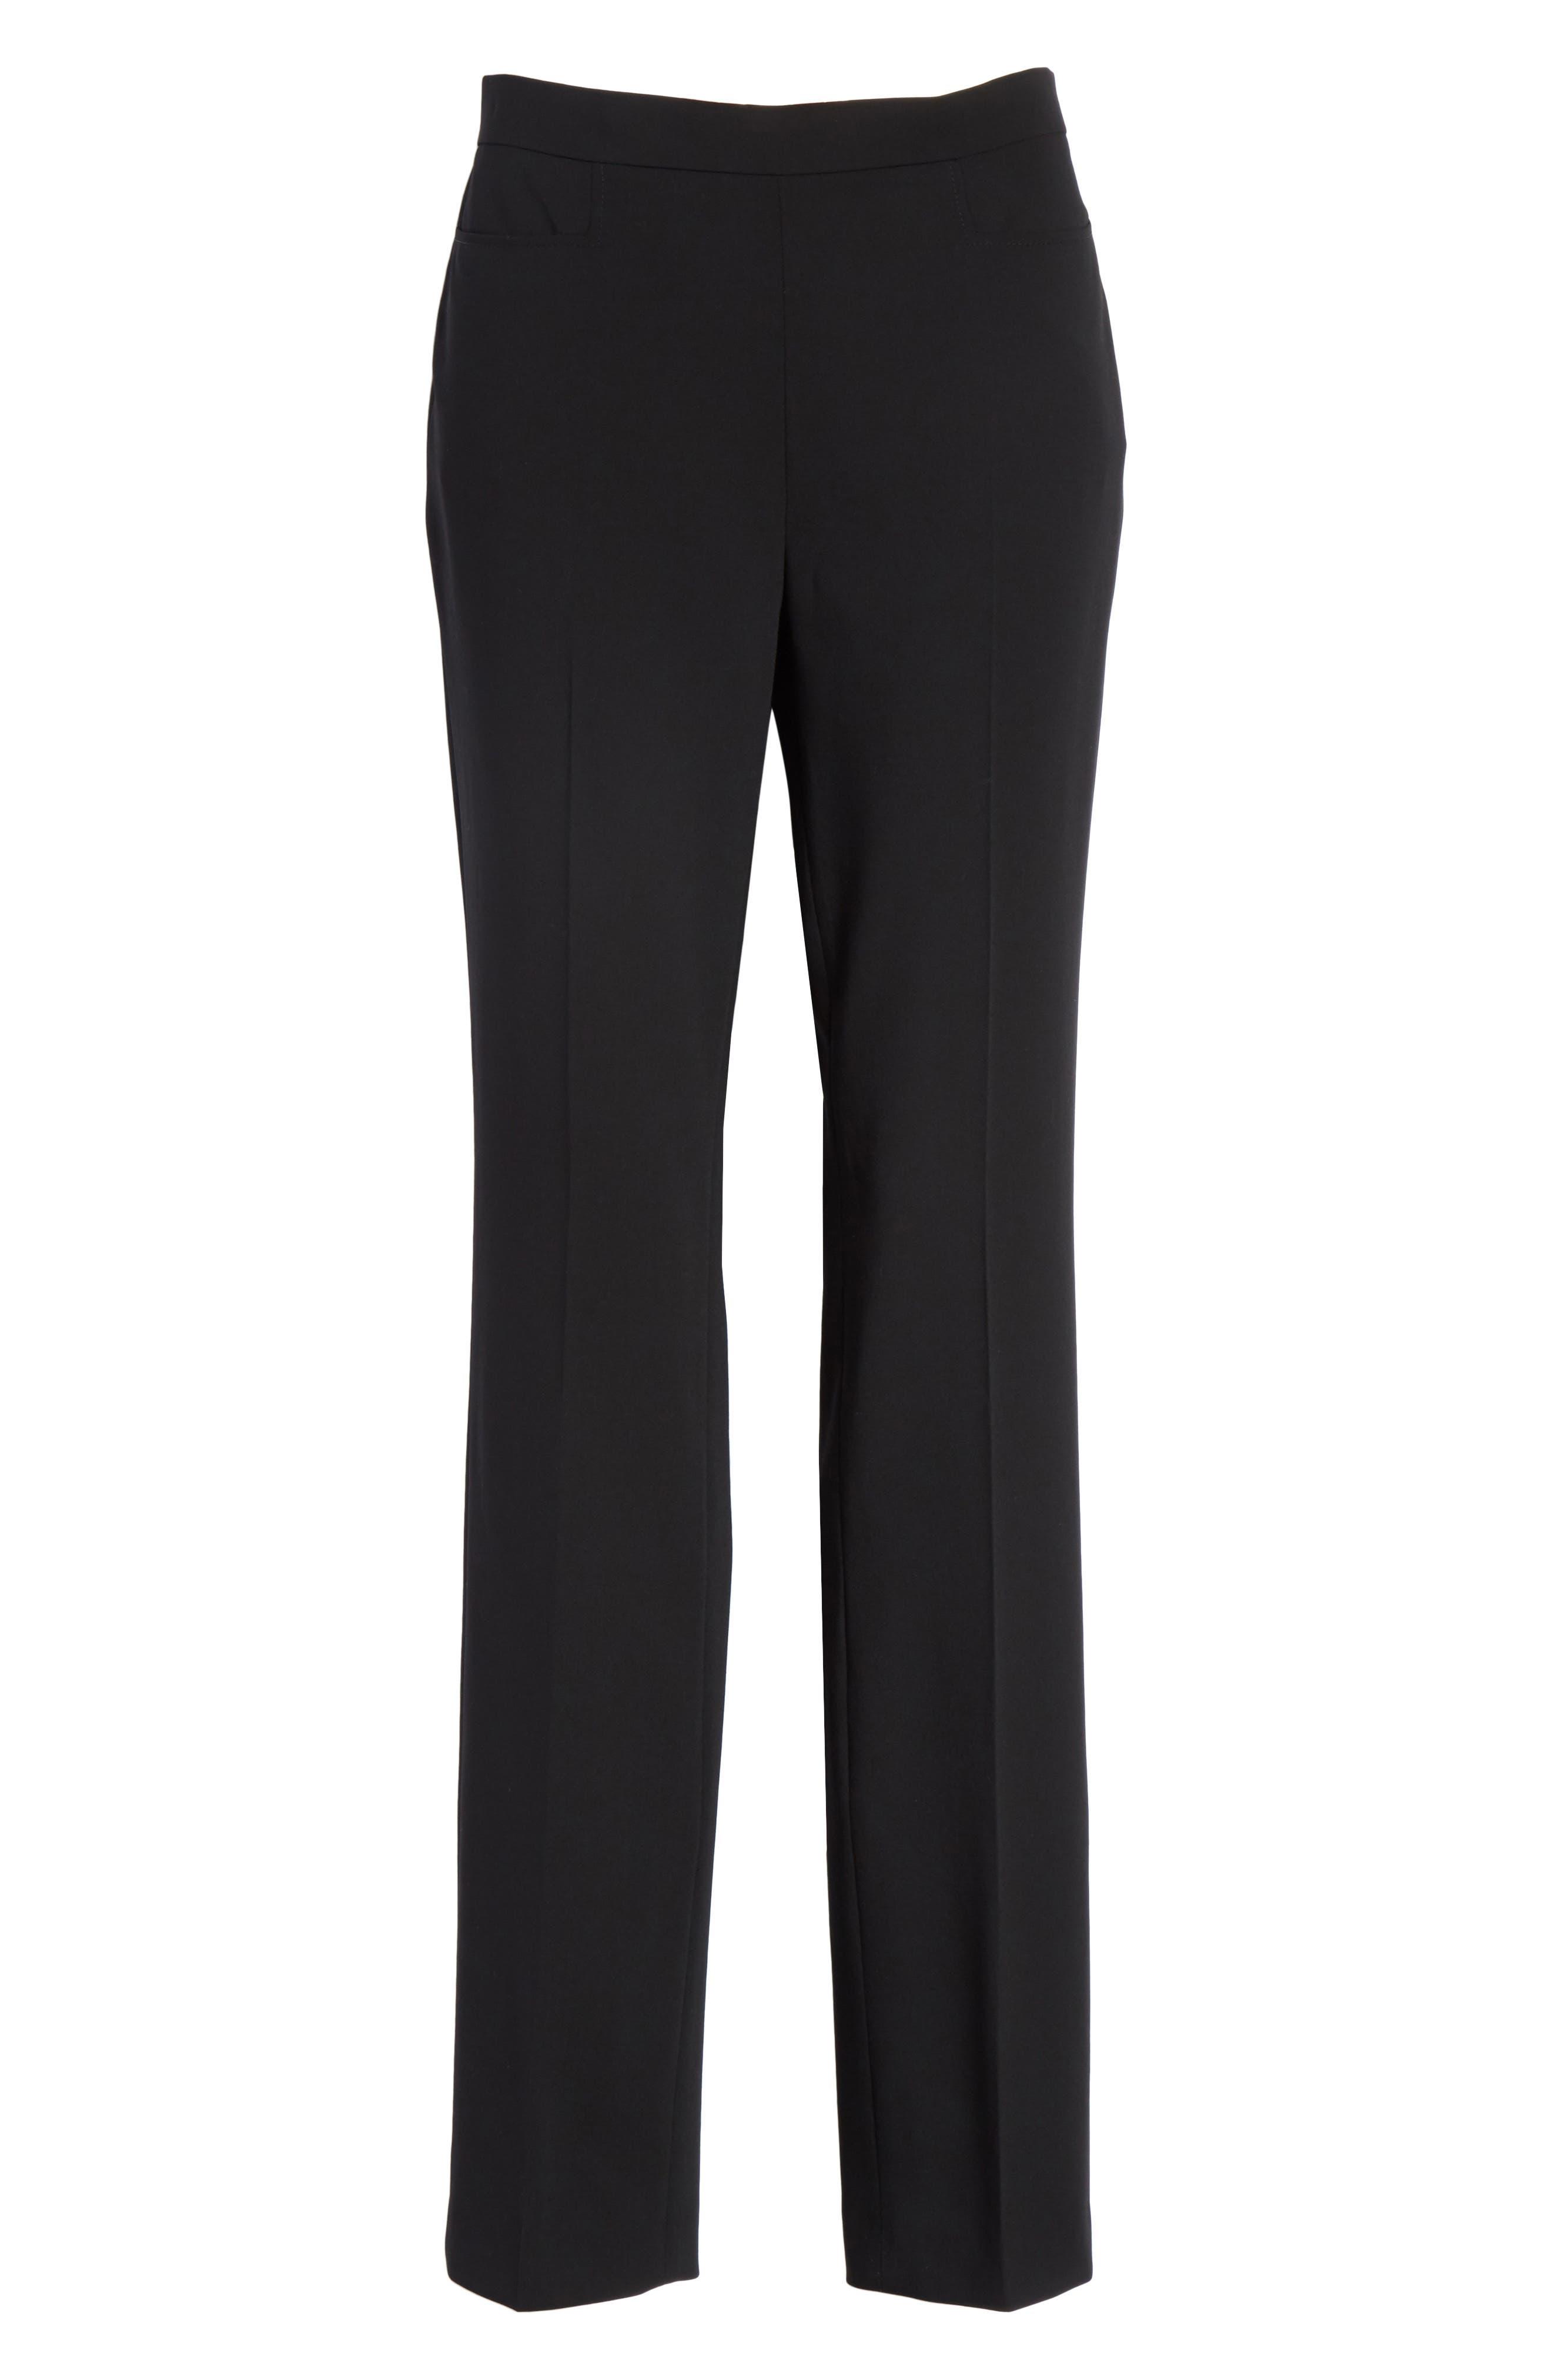 Francoise Wool Straight Leg Pants,                             Alternate thumbnail 6, color,                             BLACK